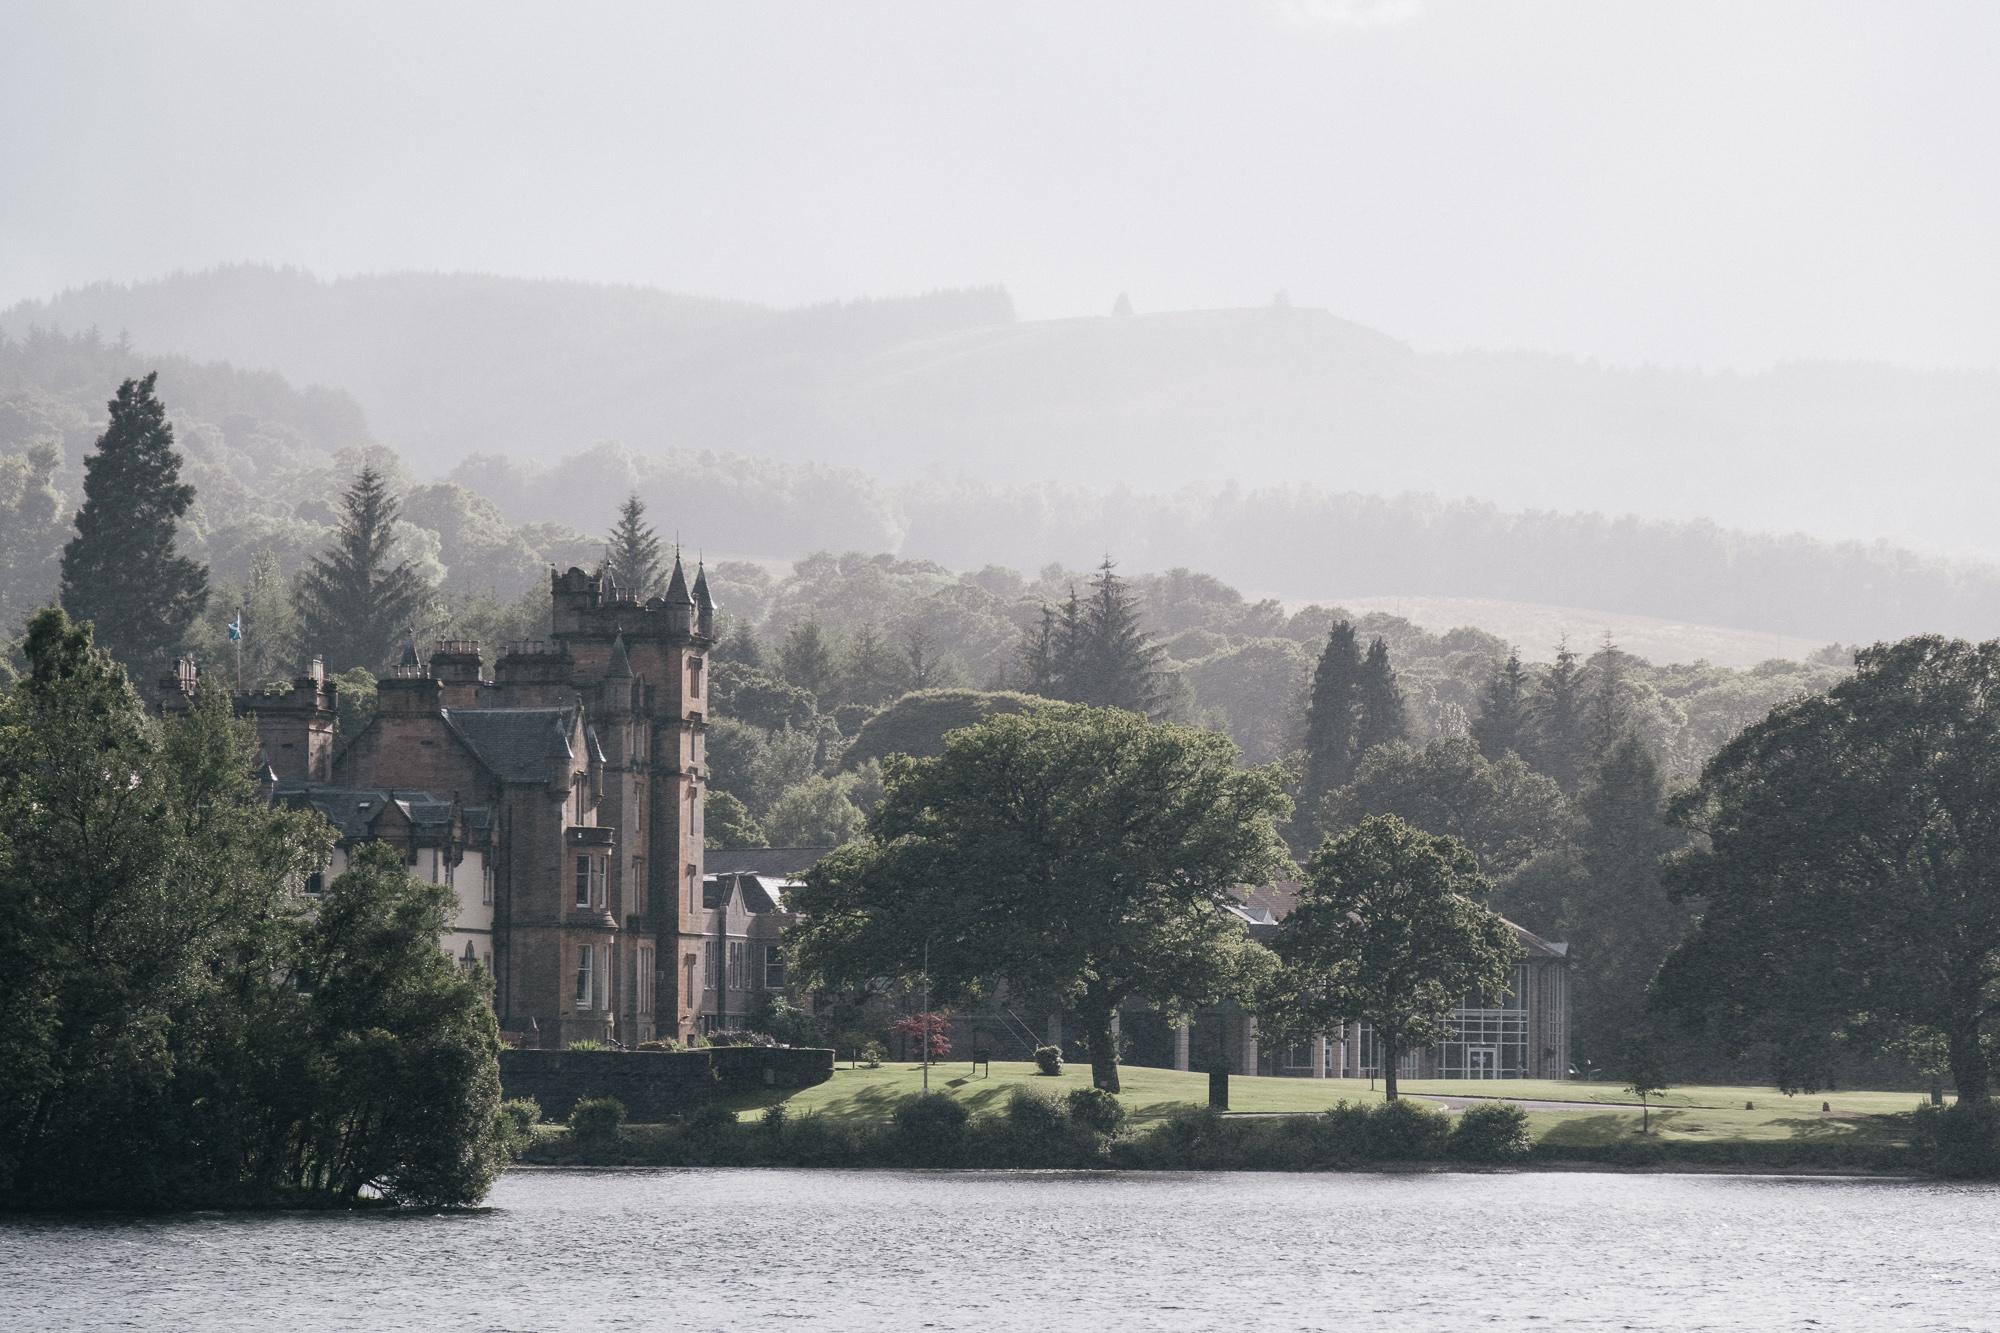 Scotland-trip-best-places-Sunset-Cruise-on-Loch-Lomond-1.jpg